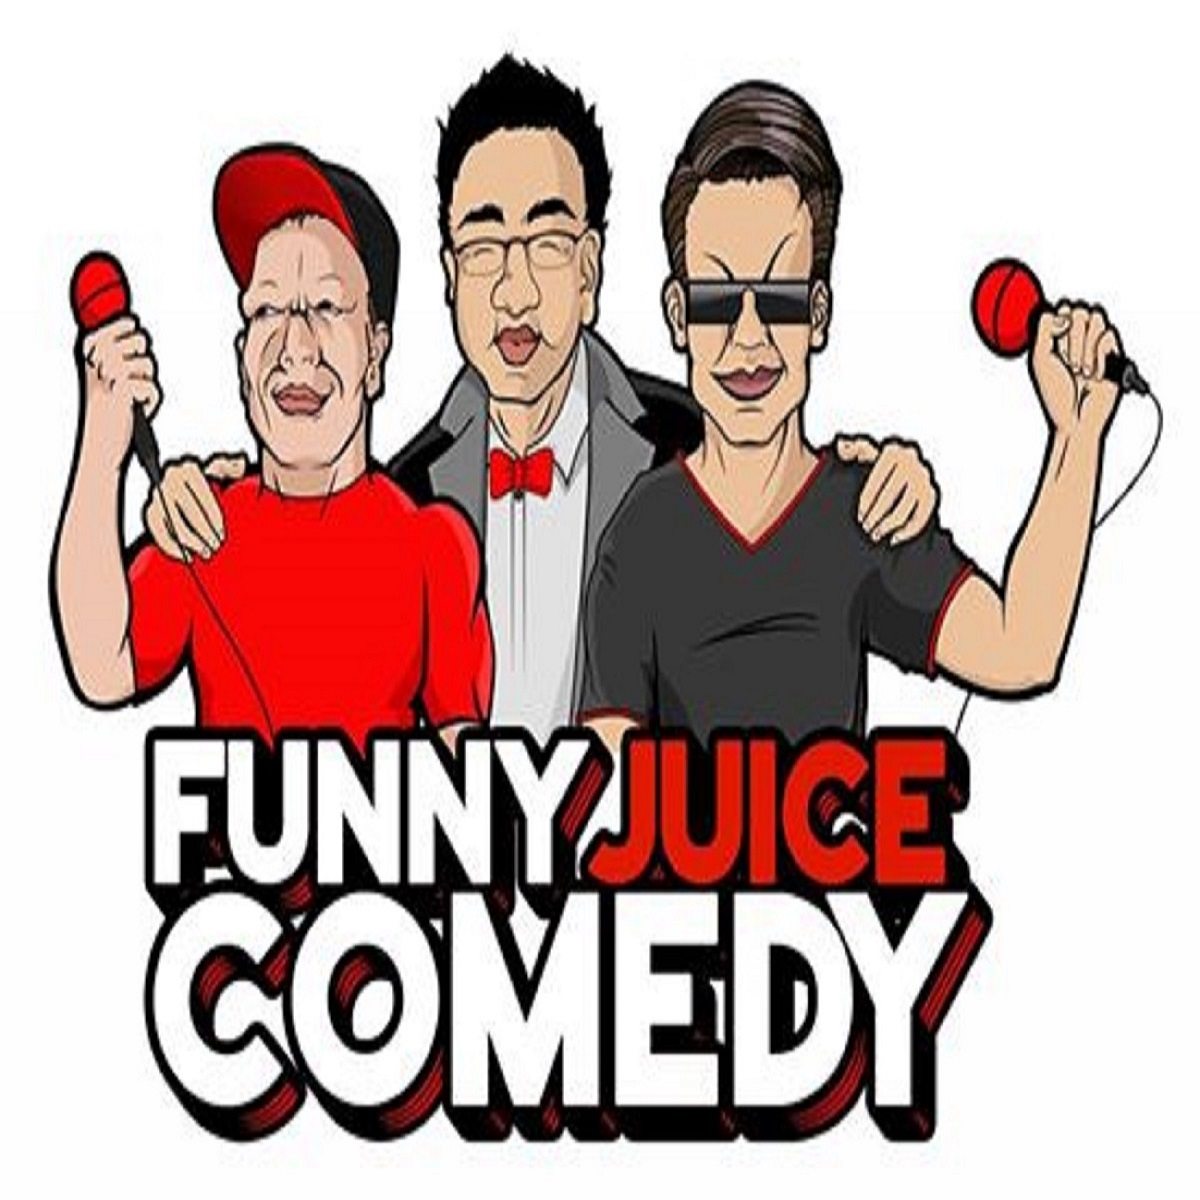 Funny Juice Comedy